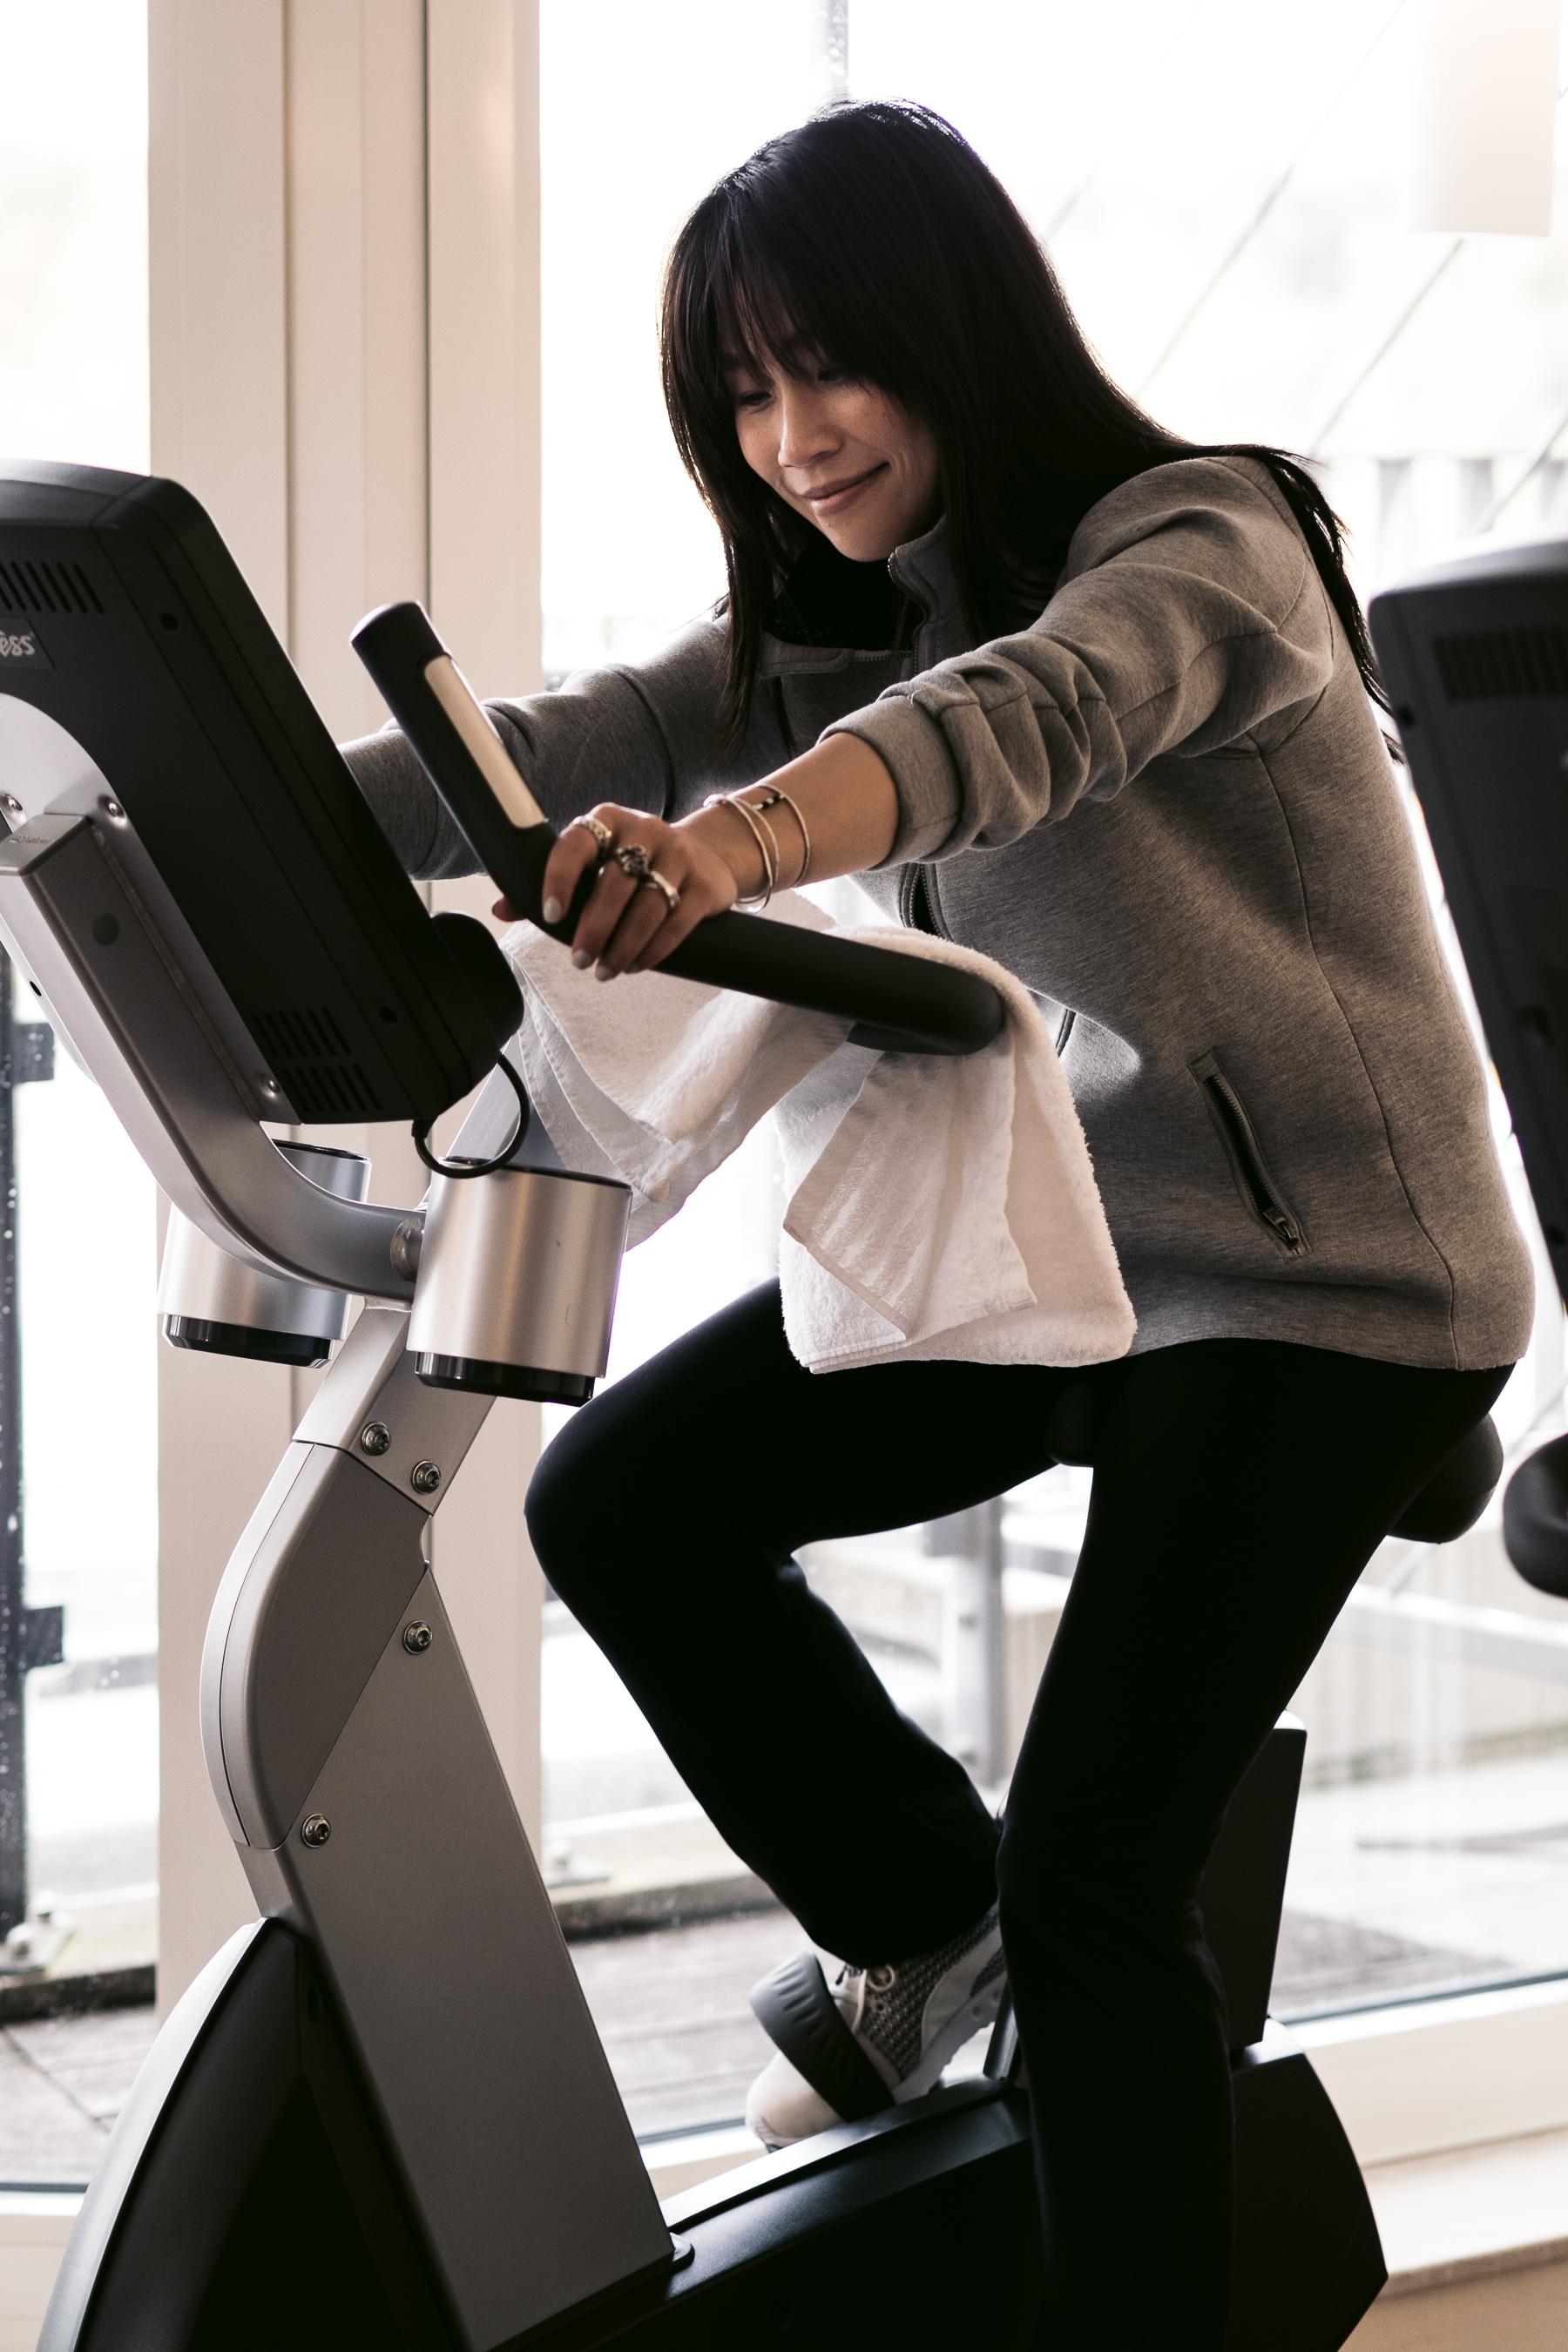 規律持續的運動習慣 - Regular exercise